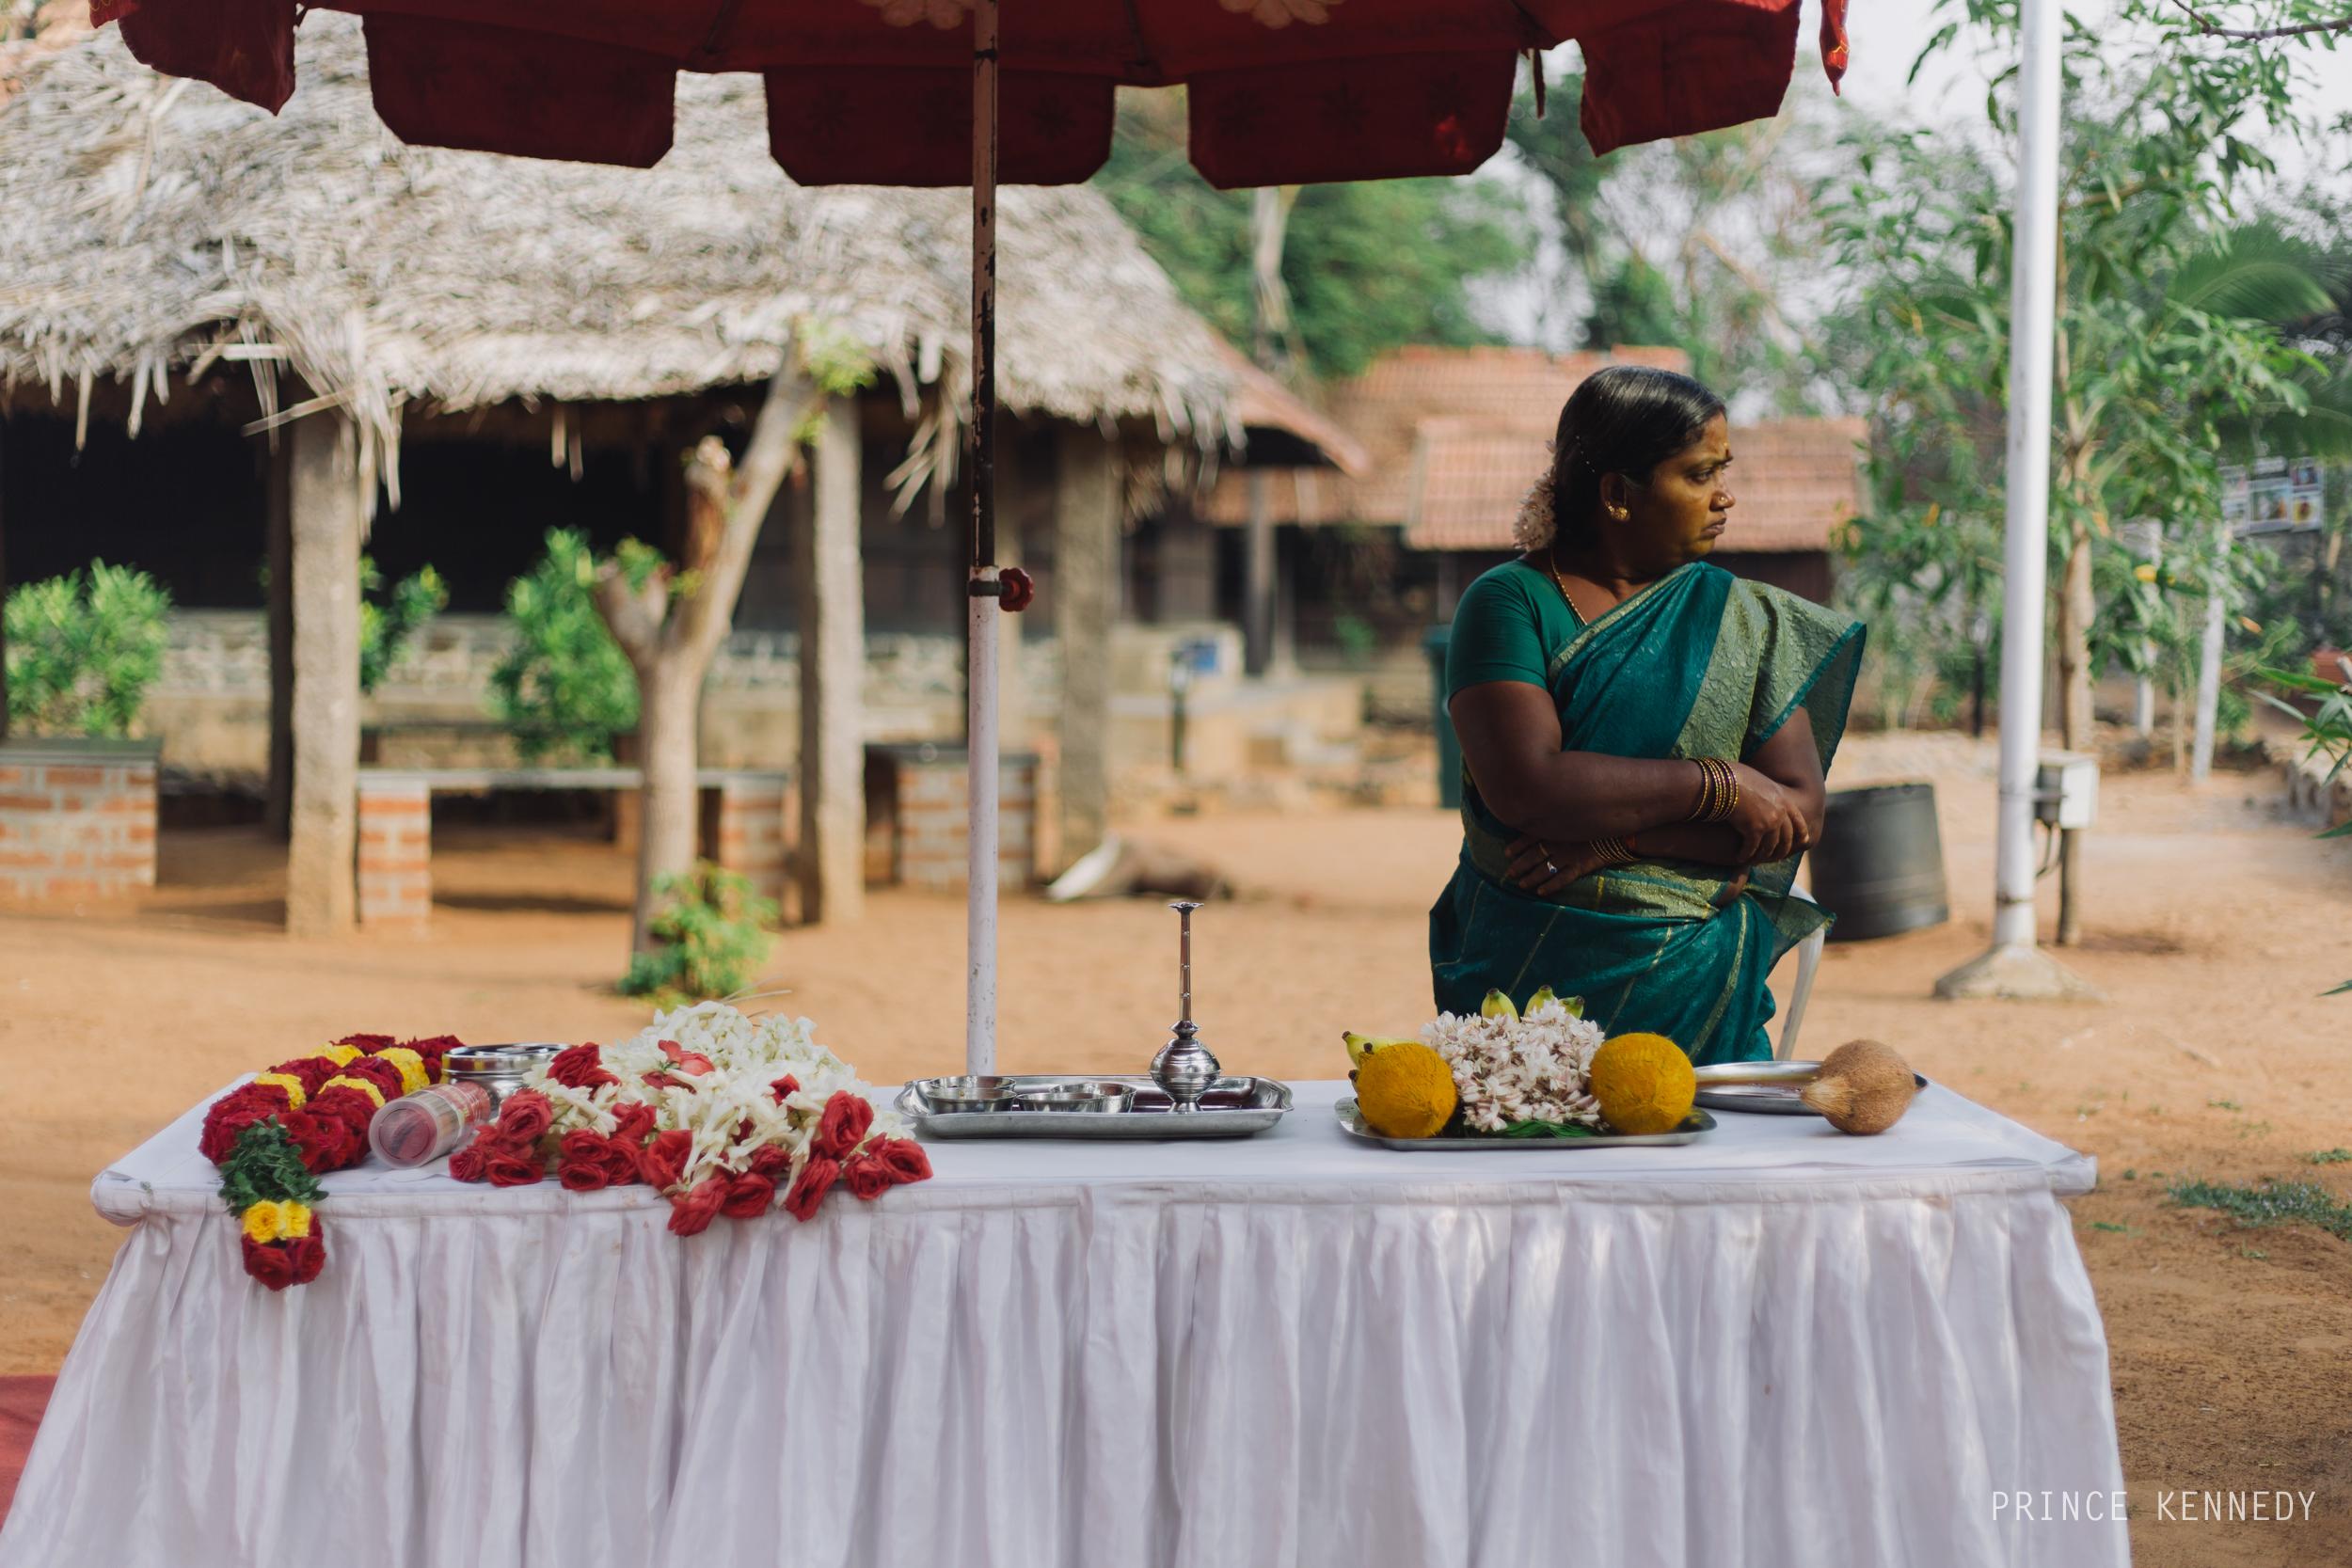 Athmajja-Nithesh-Engagement-Couple-Portrait-Portraiture-Wedding-Couple-Portrait-Chennai-Photographer-Candid-Photography-Destination-Best-Prince-Kennedy-Photography-58.jpg